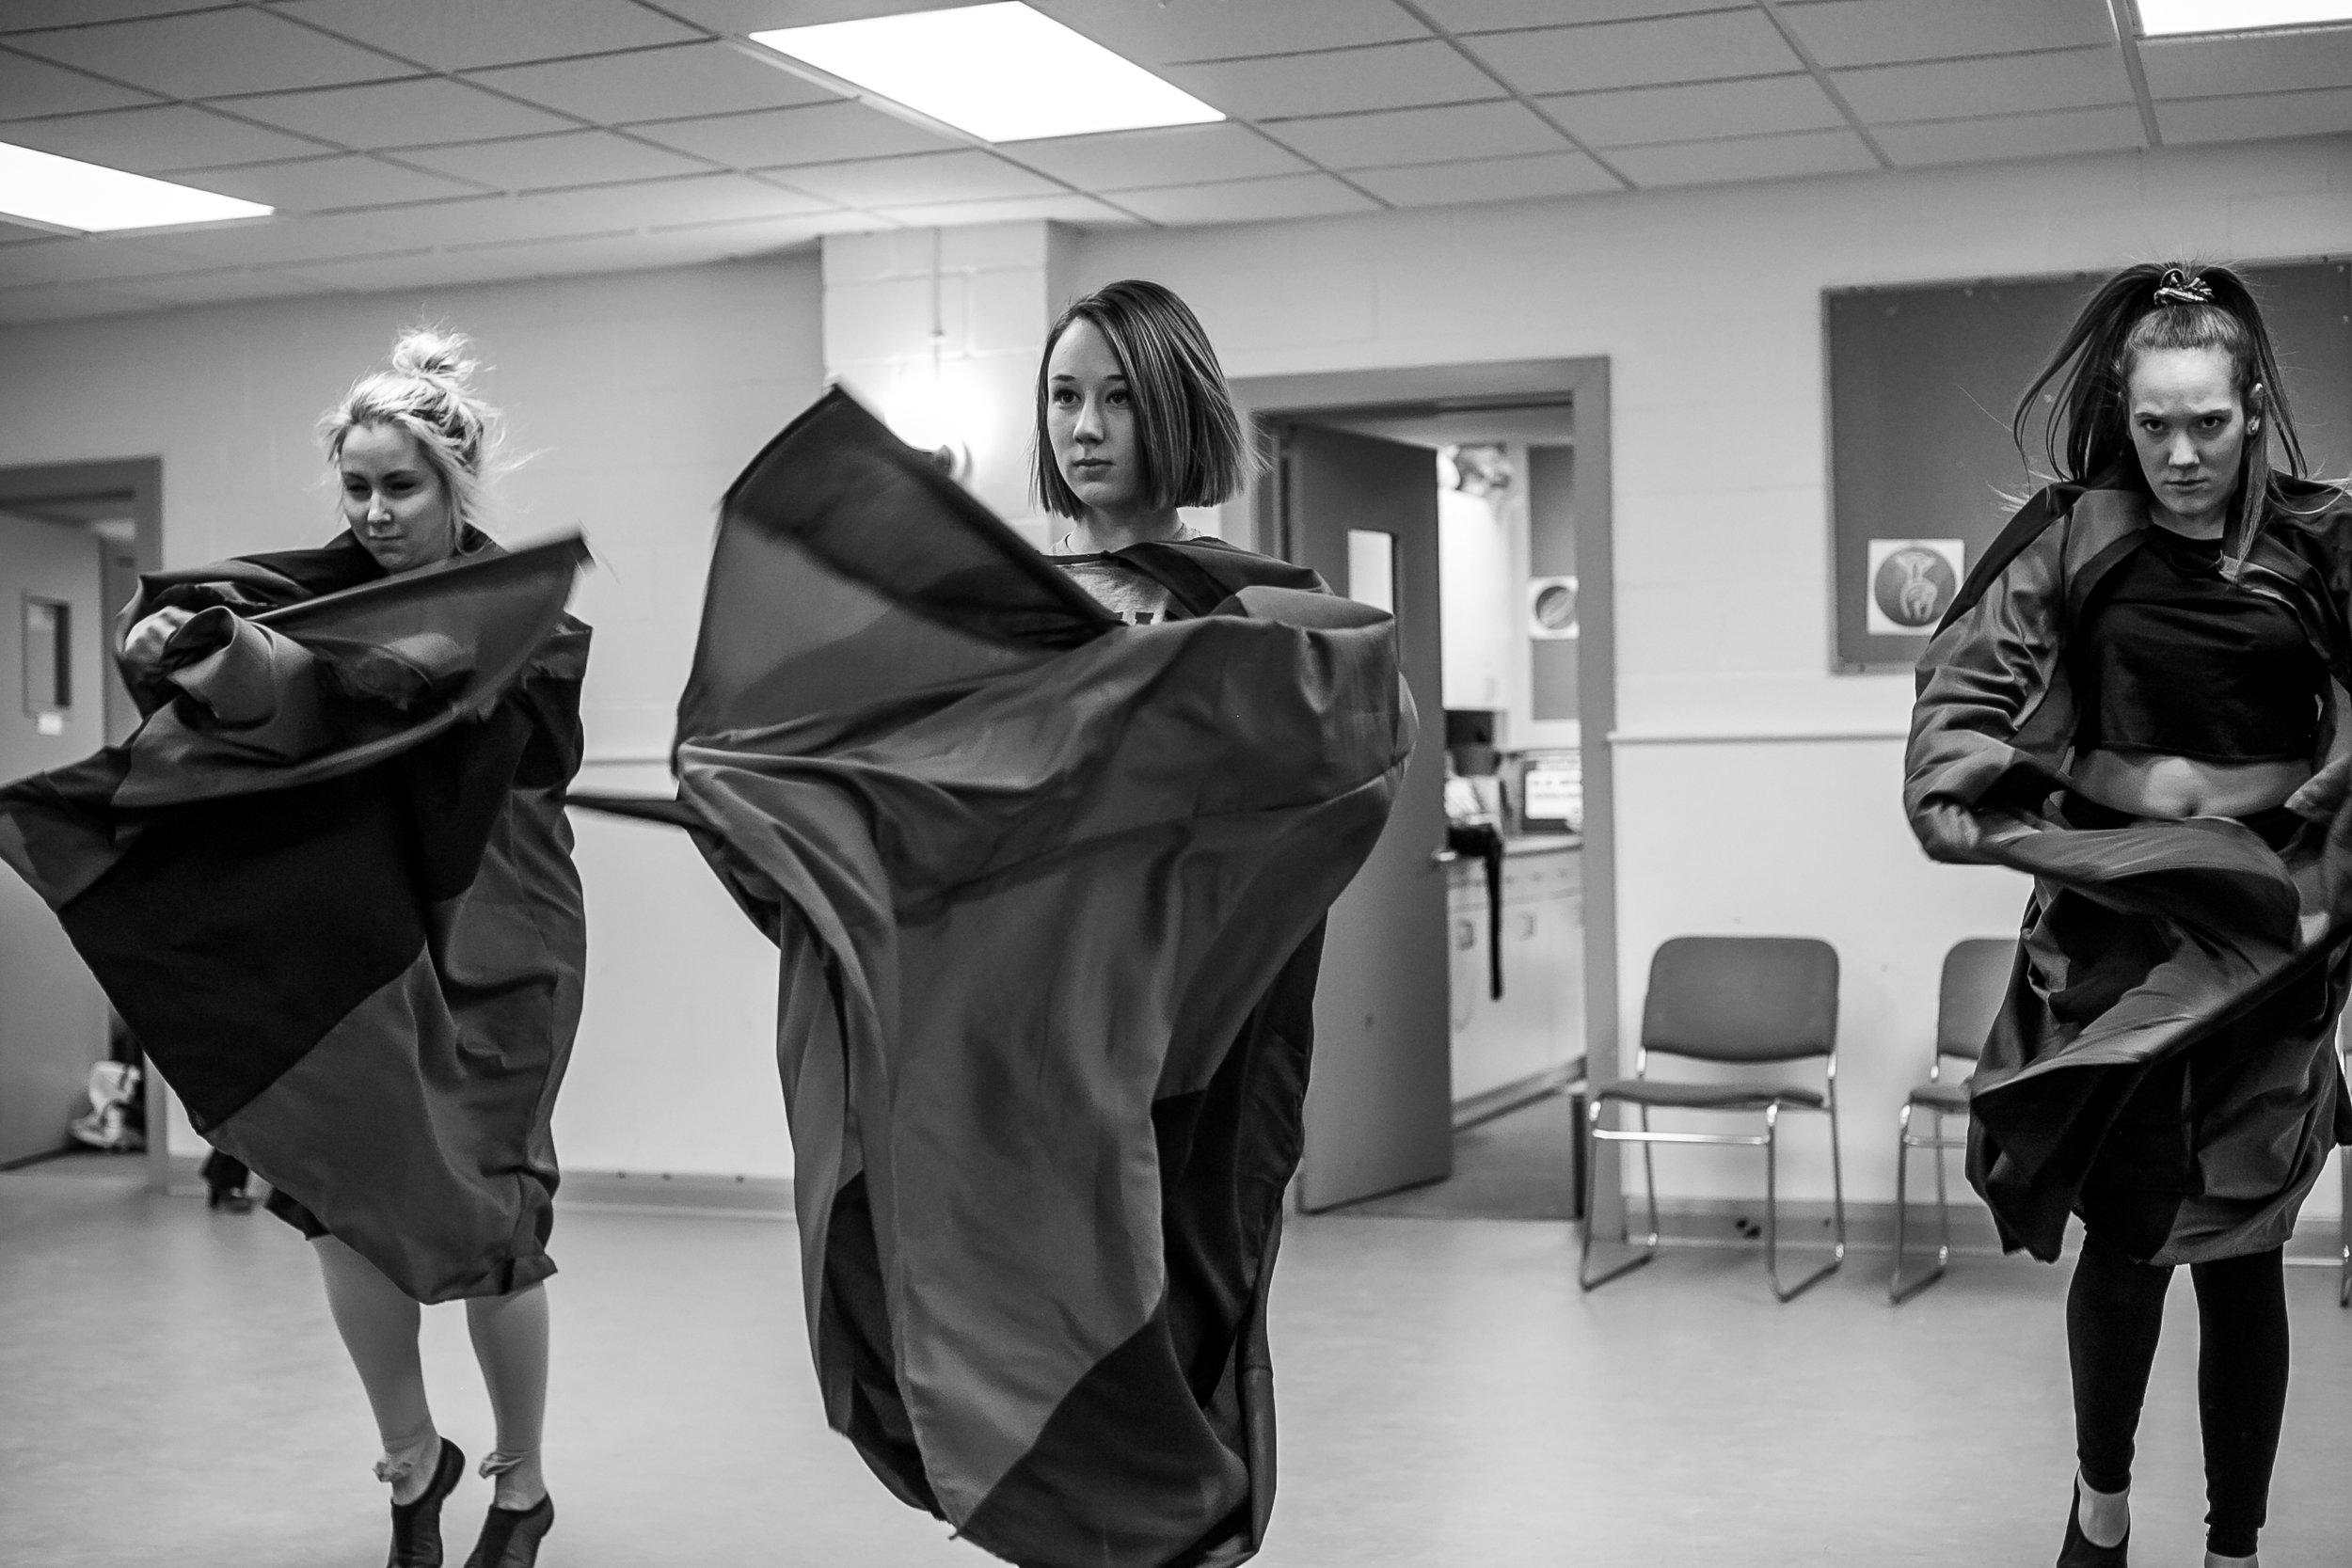 newmarket-toronto-theatre-rehearsal-musical-9.jpg